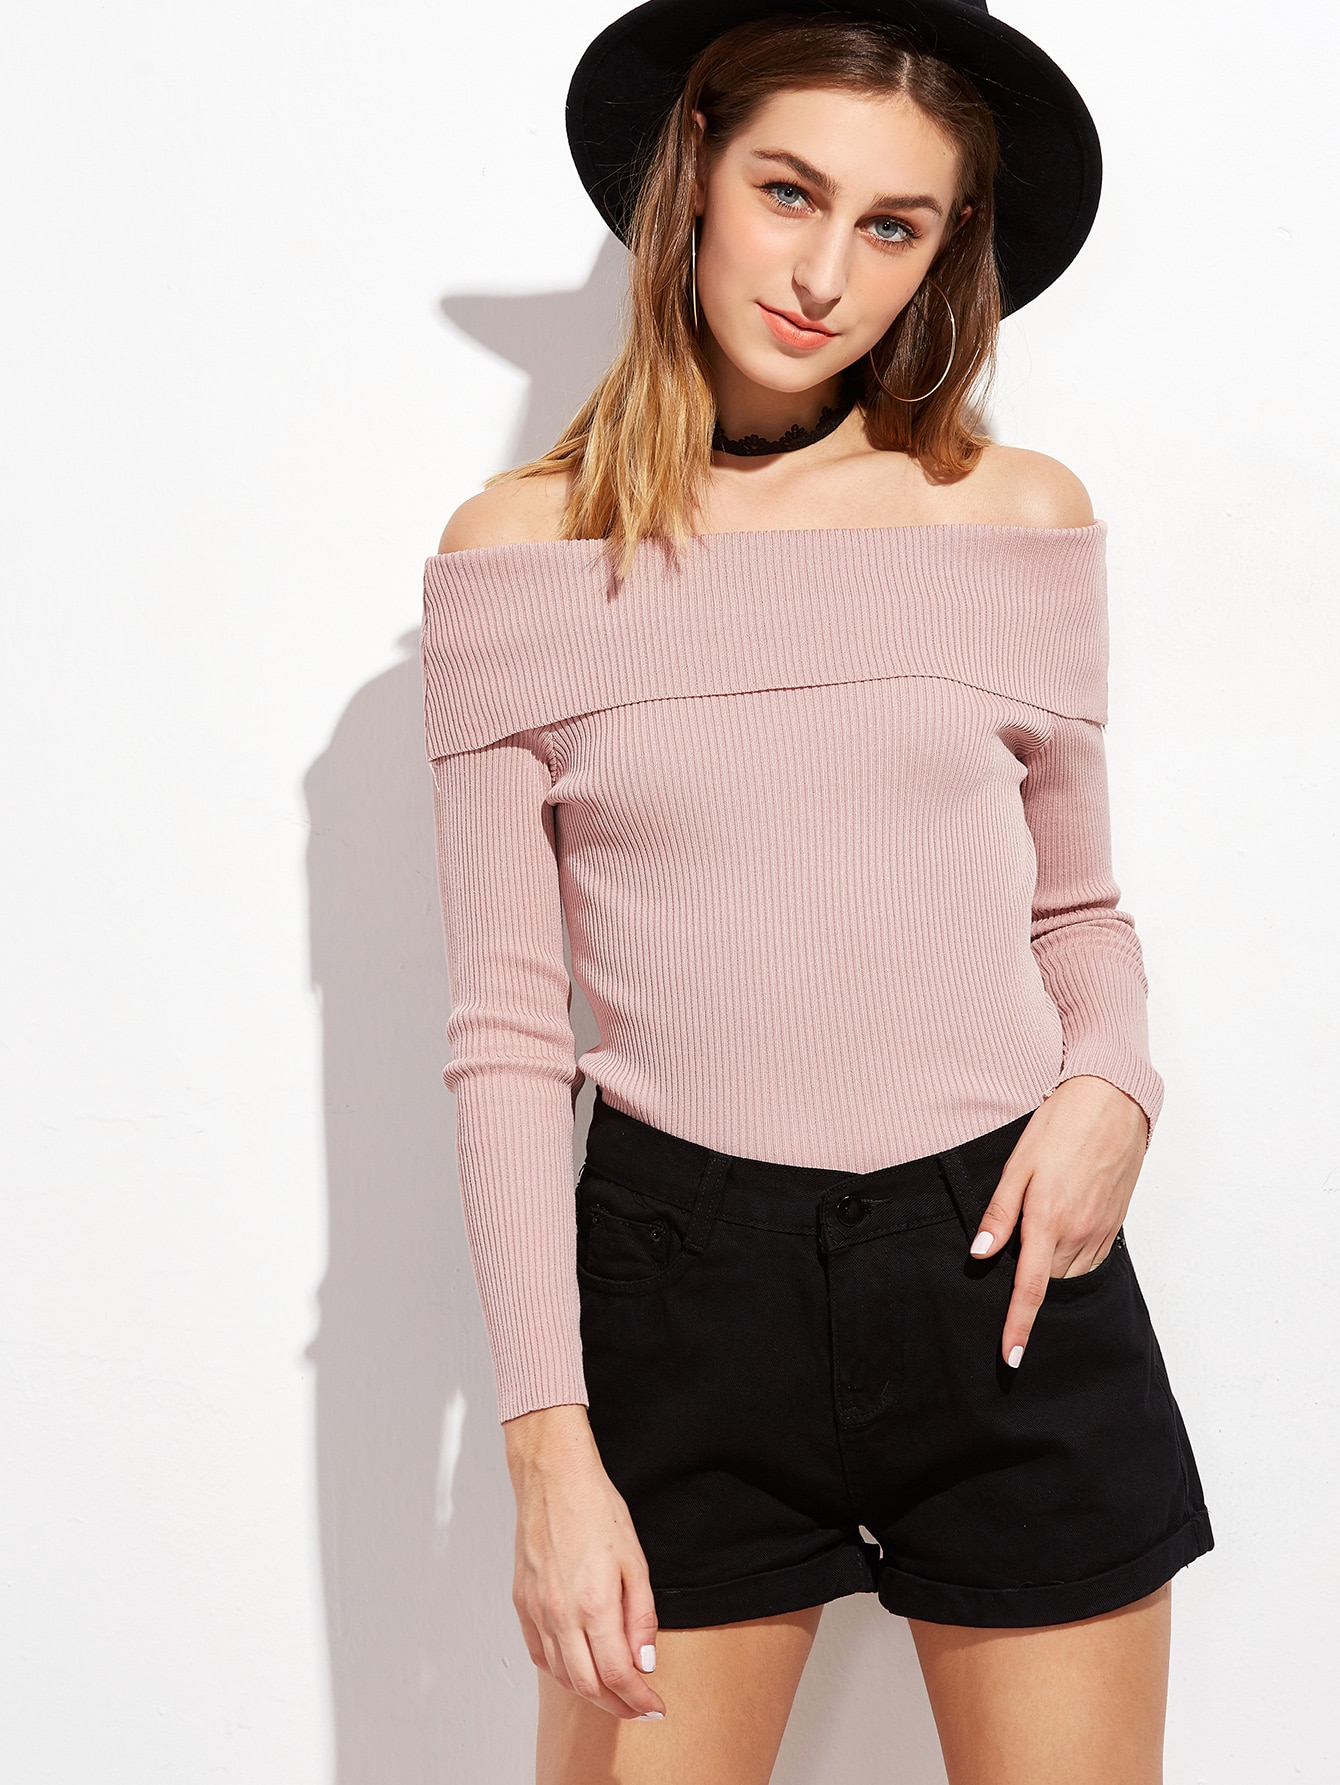 Pink Off The Shoulder Ribbed Foldover SweaterPink Off The Shoulder Ribbed Foldover Sweater<br><br>color: Pink<br>size: one-size